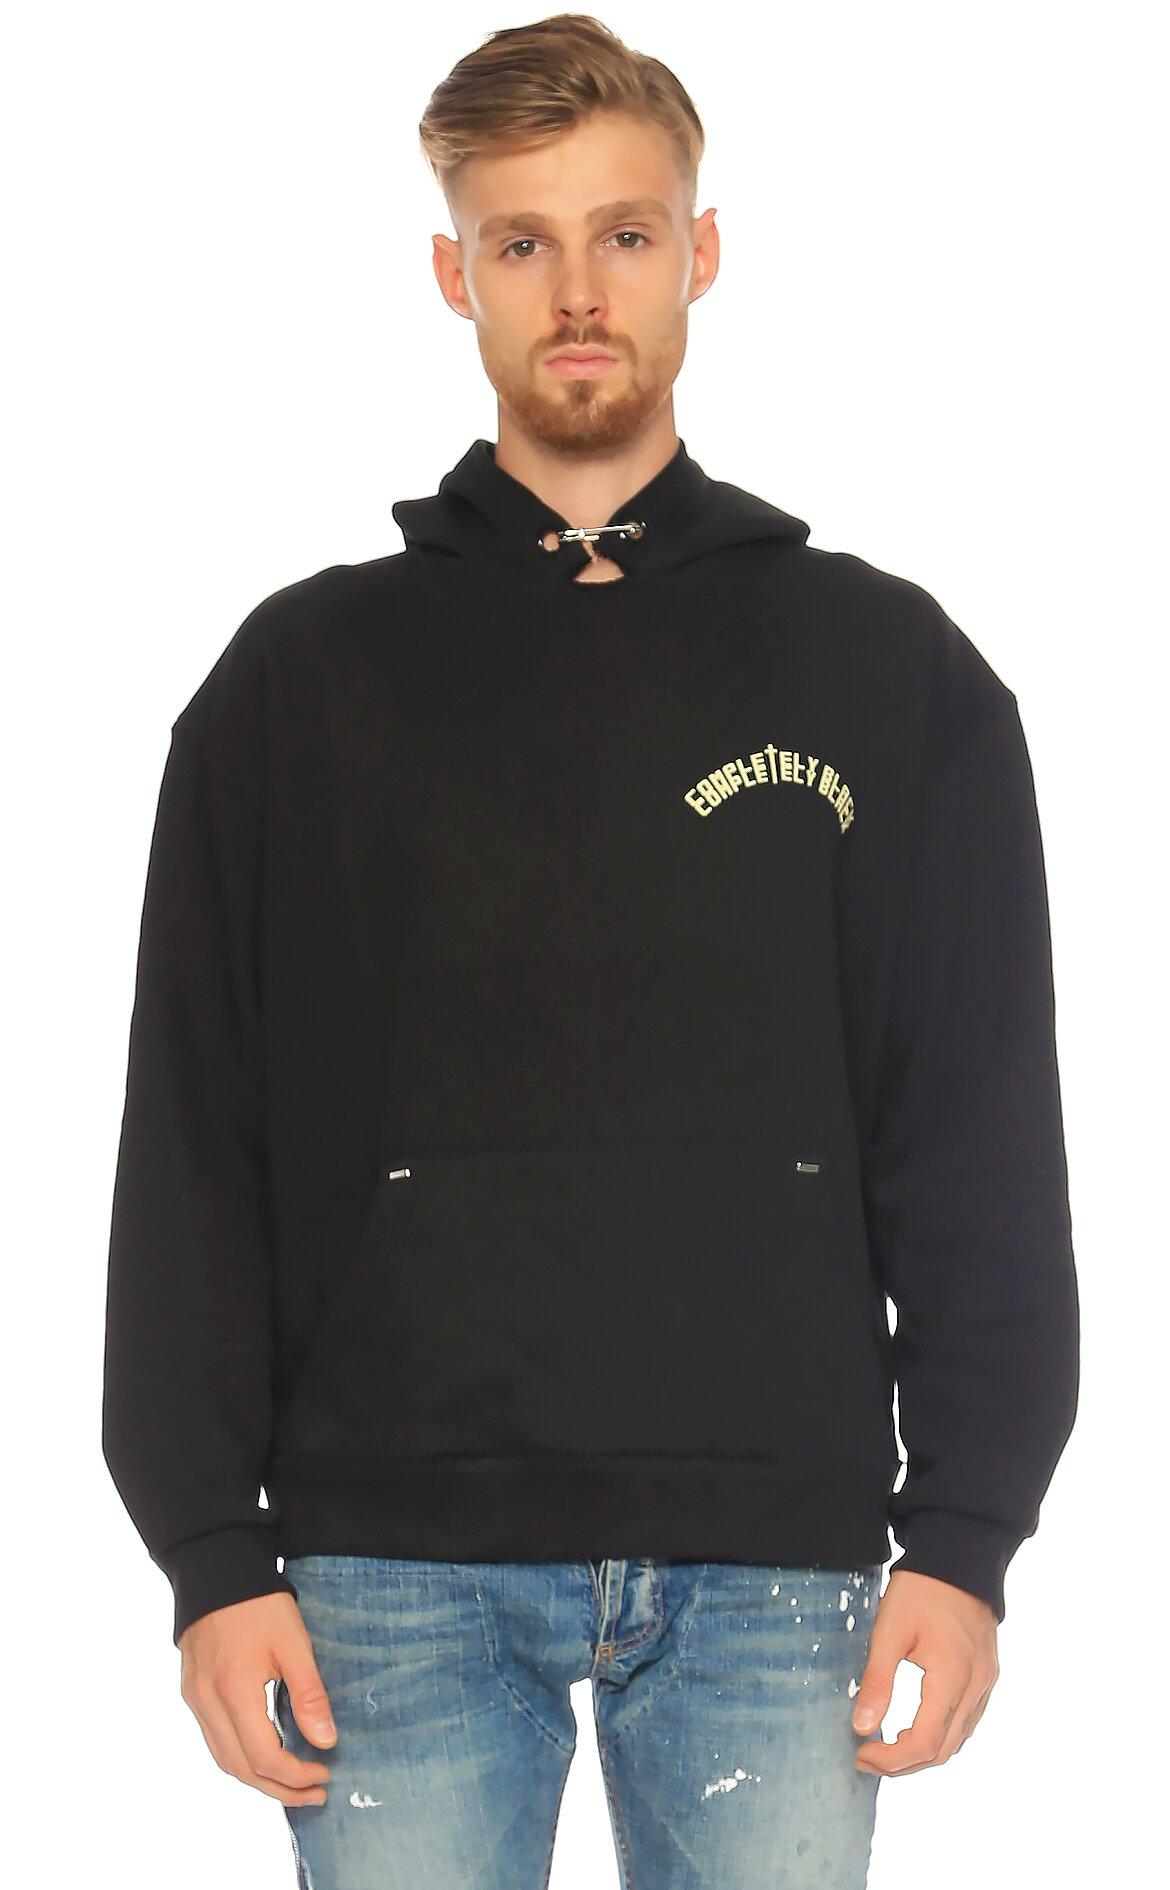 Mr Completely-Mr Completely Kapüşonlu Siyah Sweatshirt